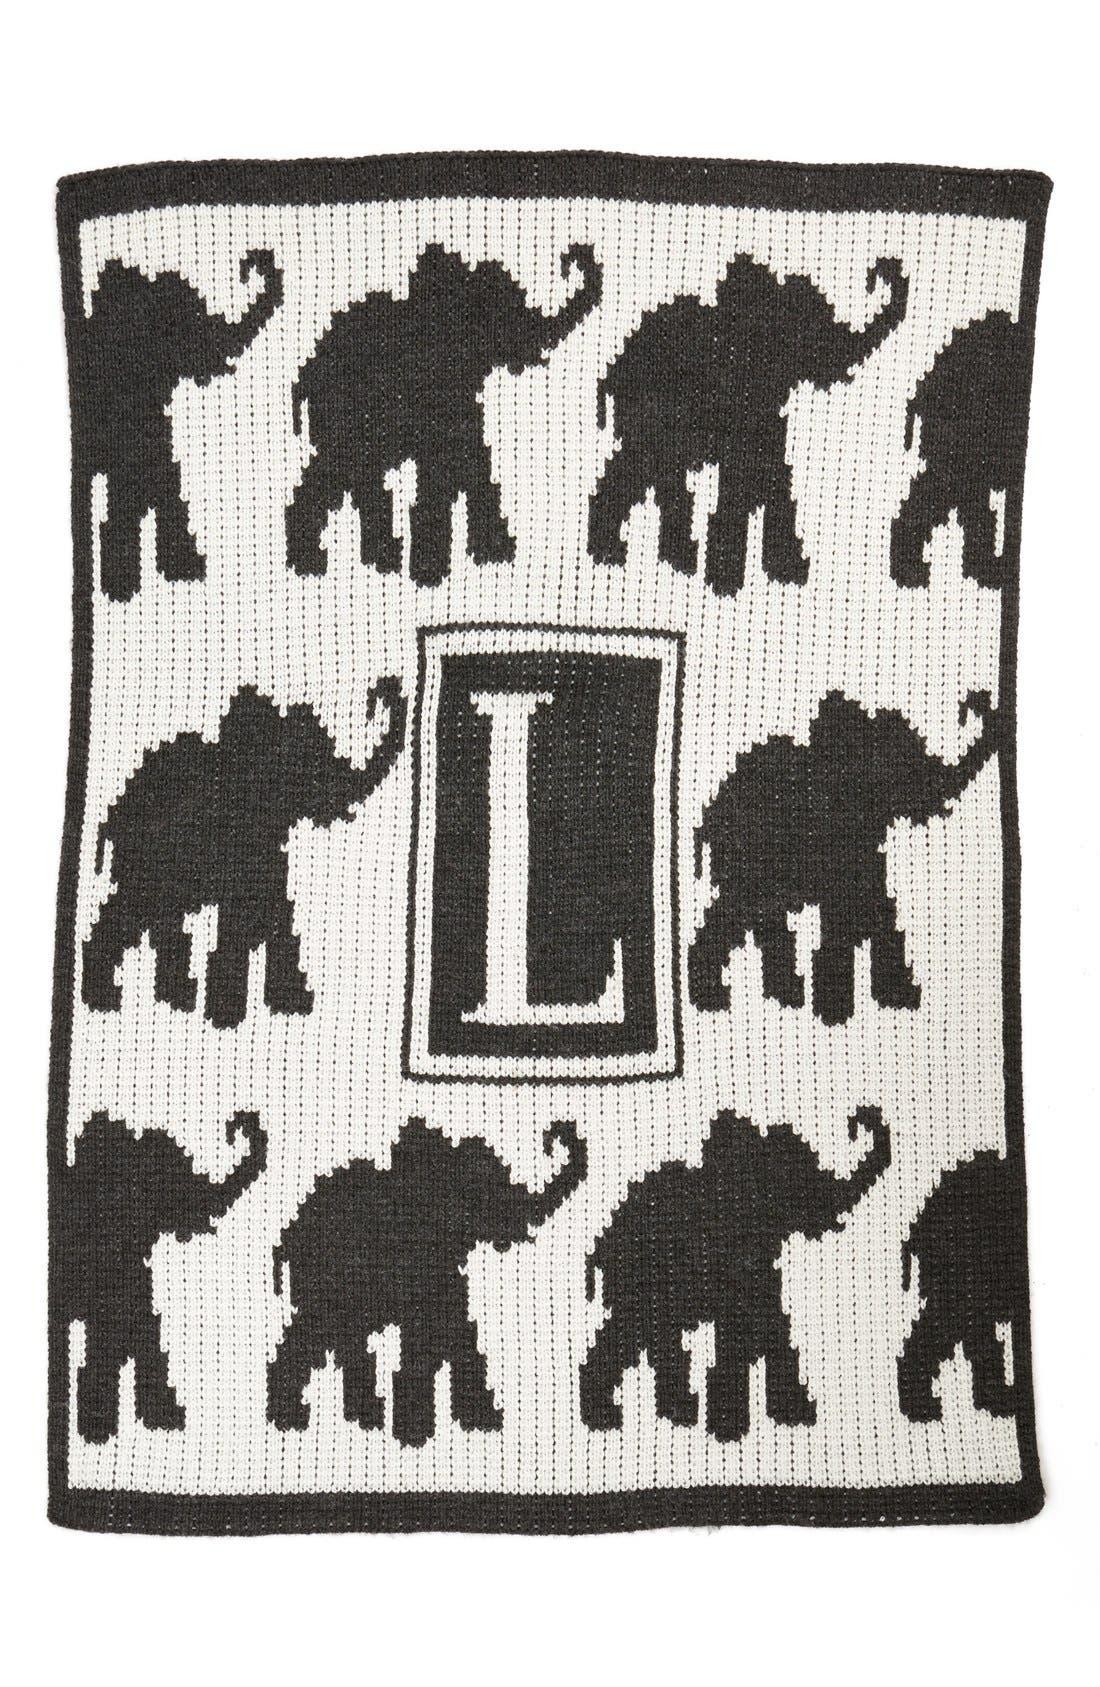 'Walking Elephants - Small' Personalized Blanket,                             Main thumbnail 1, color,                             020